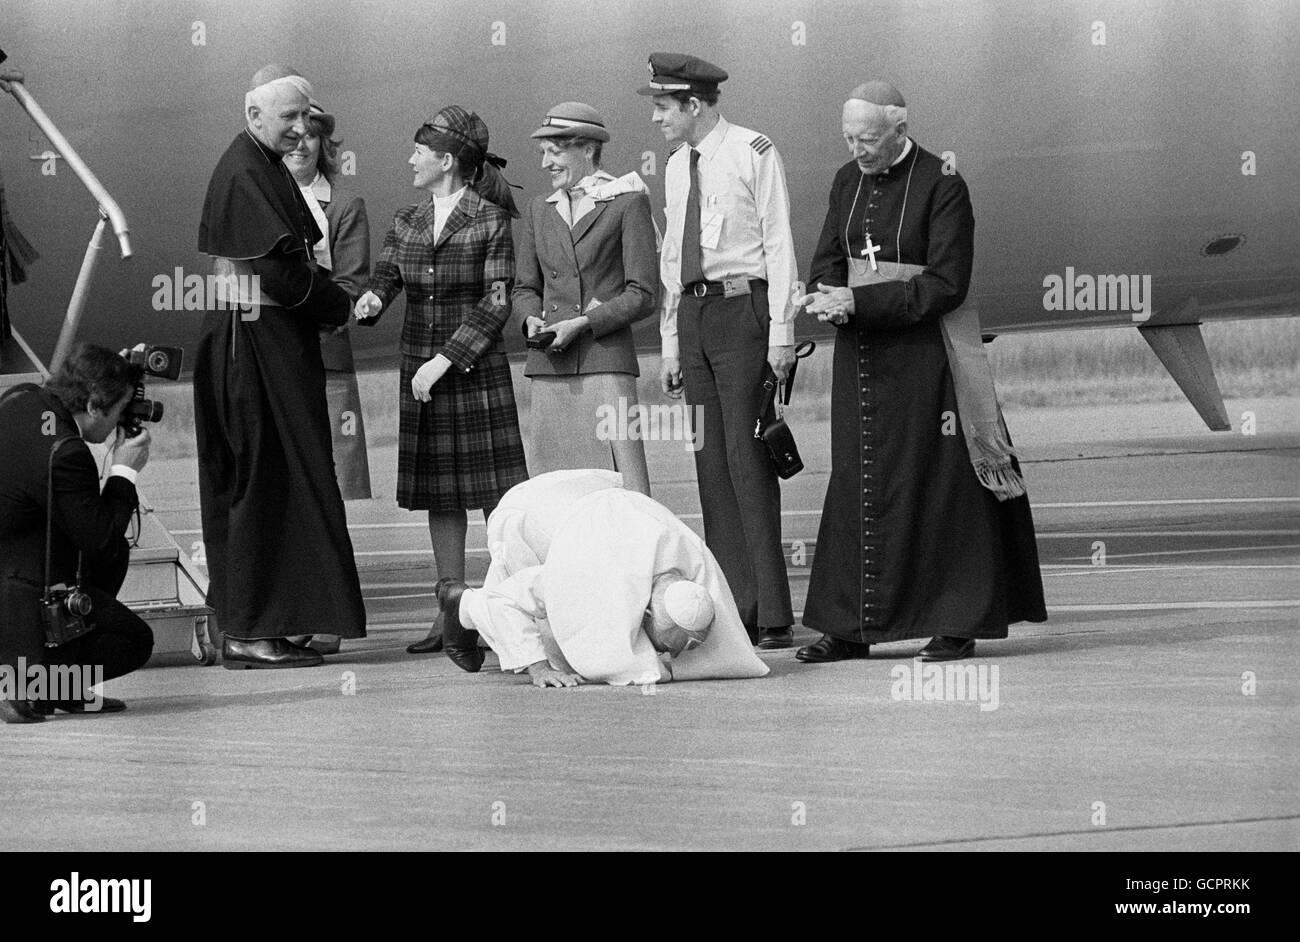 Religion - Pope John Paul II Visit to Britain - Cardiff Airport - 1982 Stock Photo